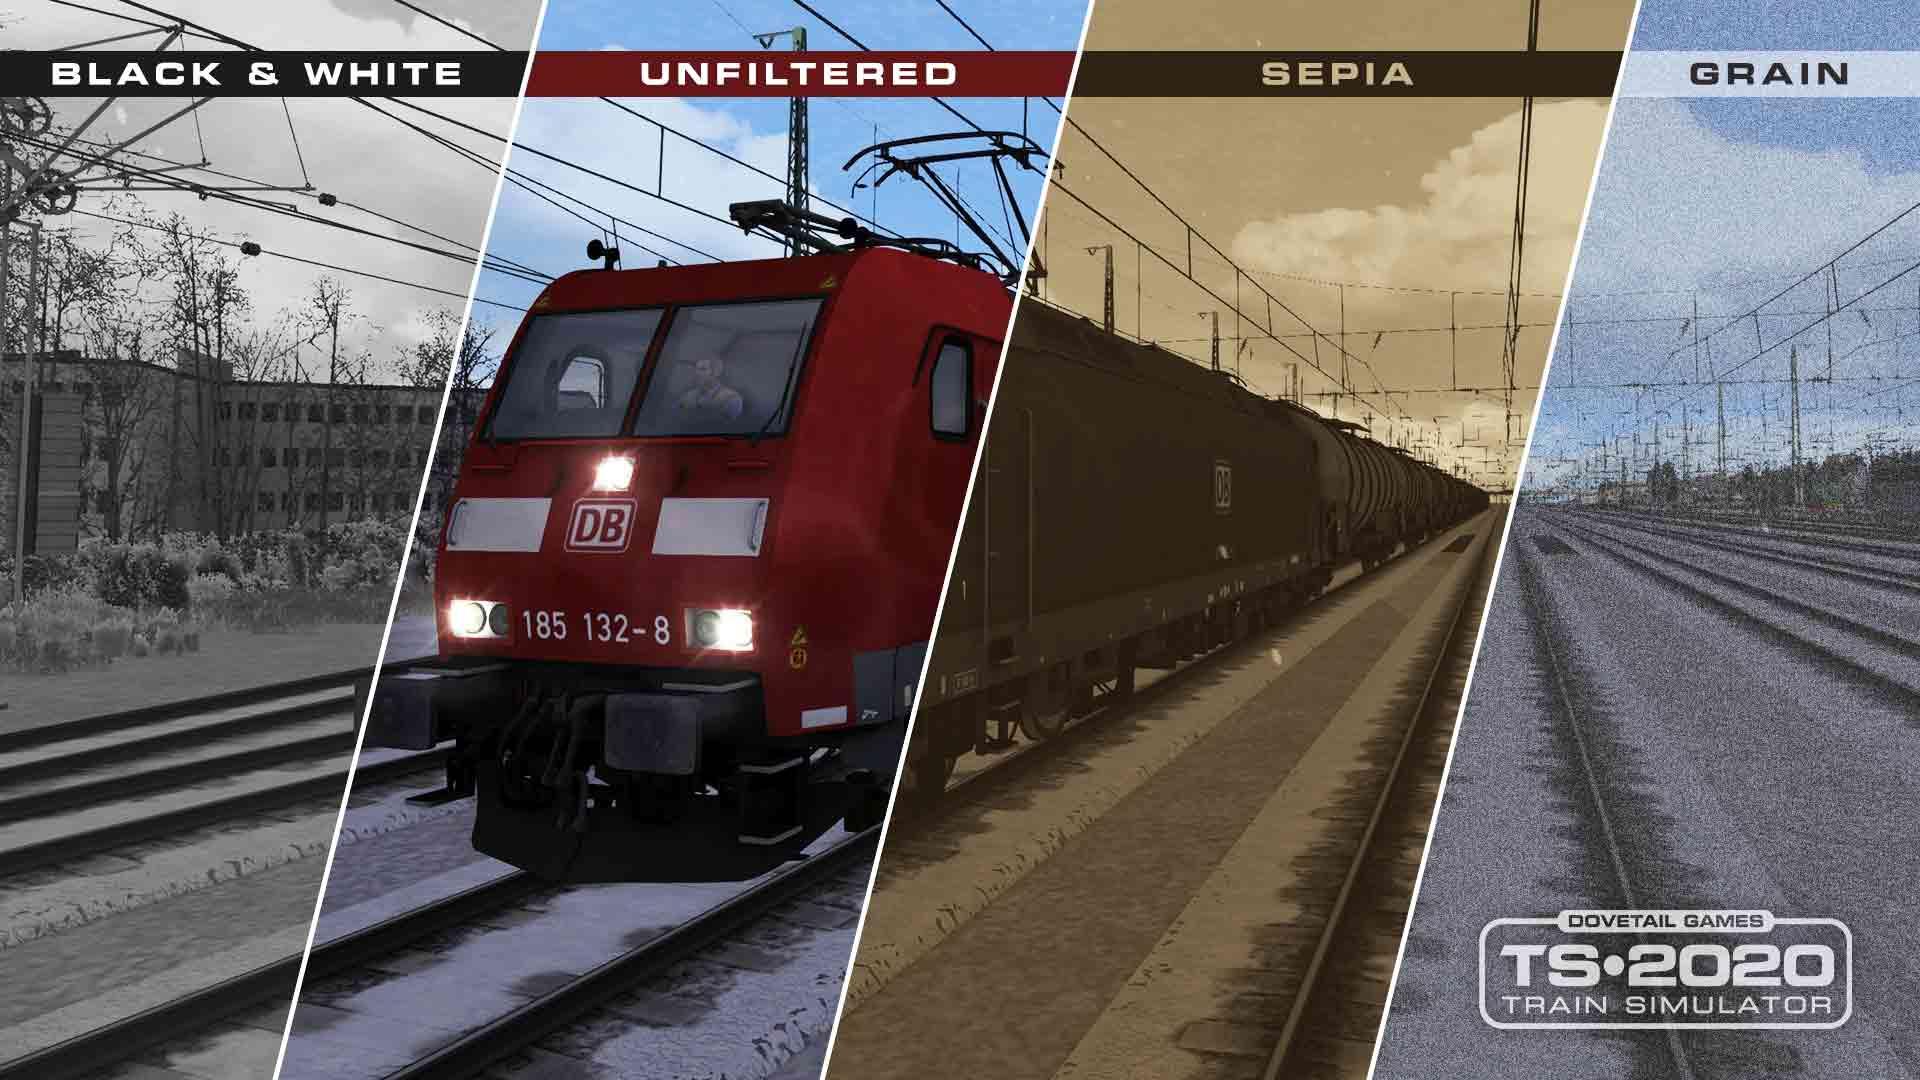 Train Simulator 2020 game image